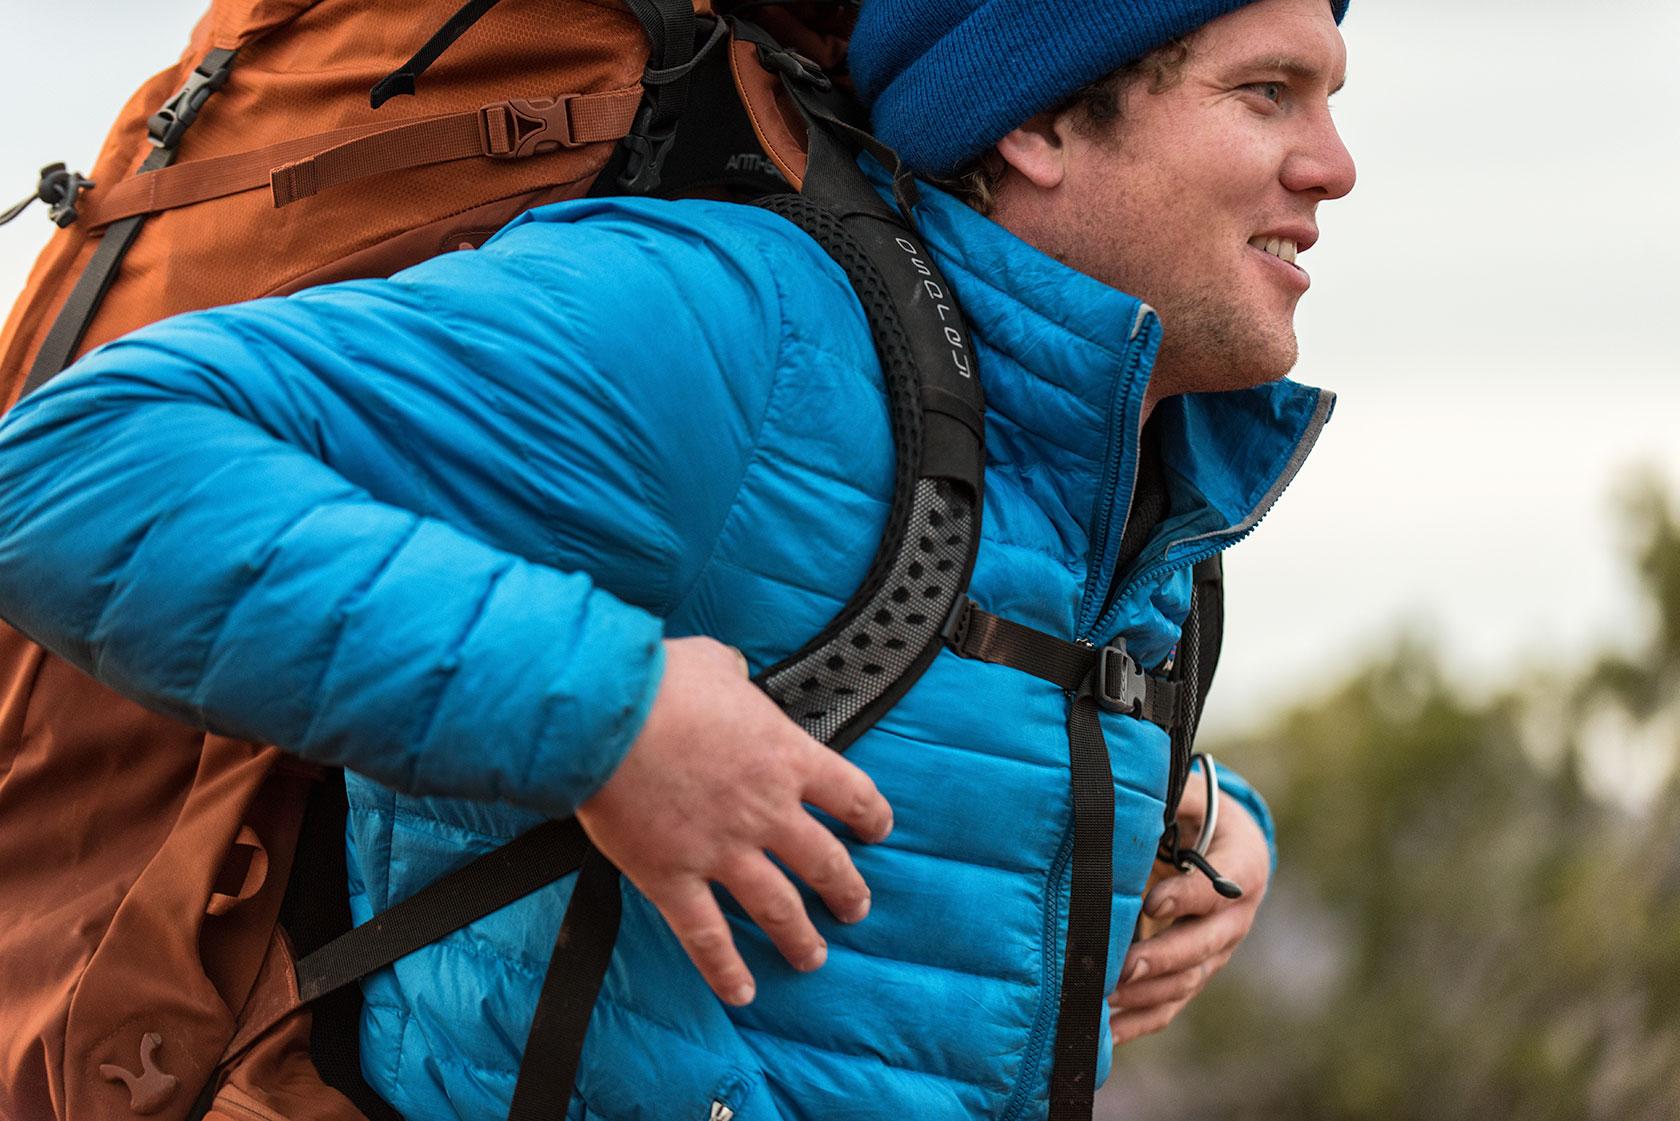 austin-trigg-osprey-hiking-backpacks-grand-canyon-osprey-pack-bag-arizona-hike-camp-lifestyle-product-.jpg